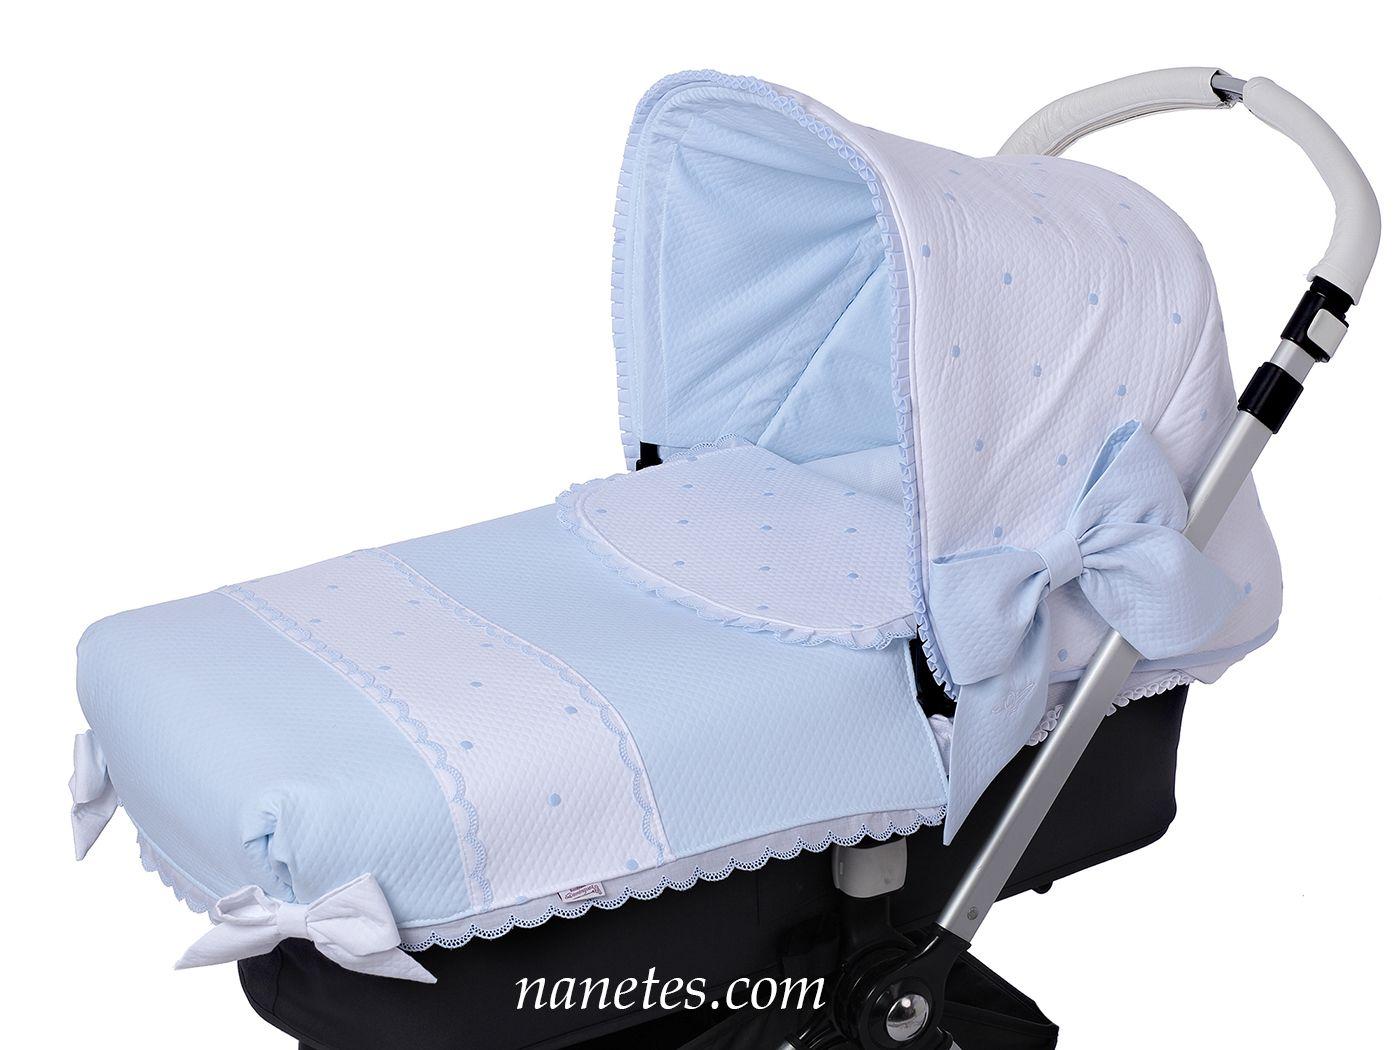 Carrito de bebé vestido a medida | Carros bebe, Carritos de